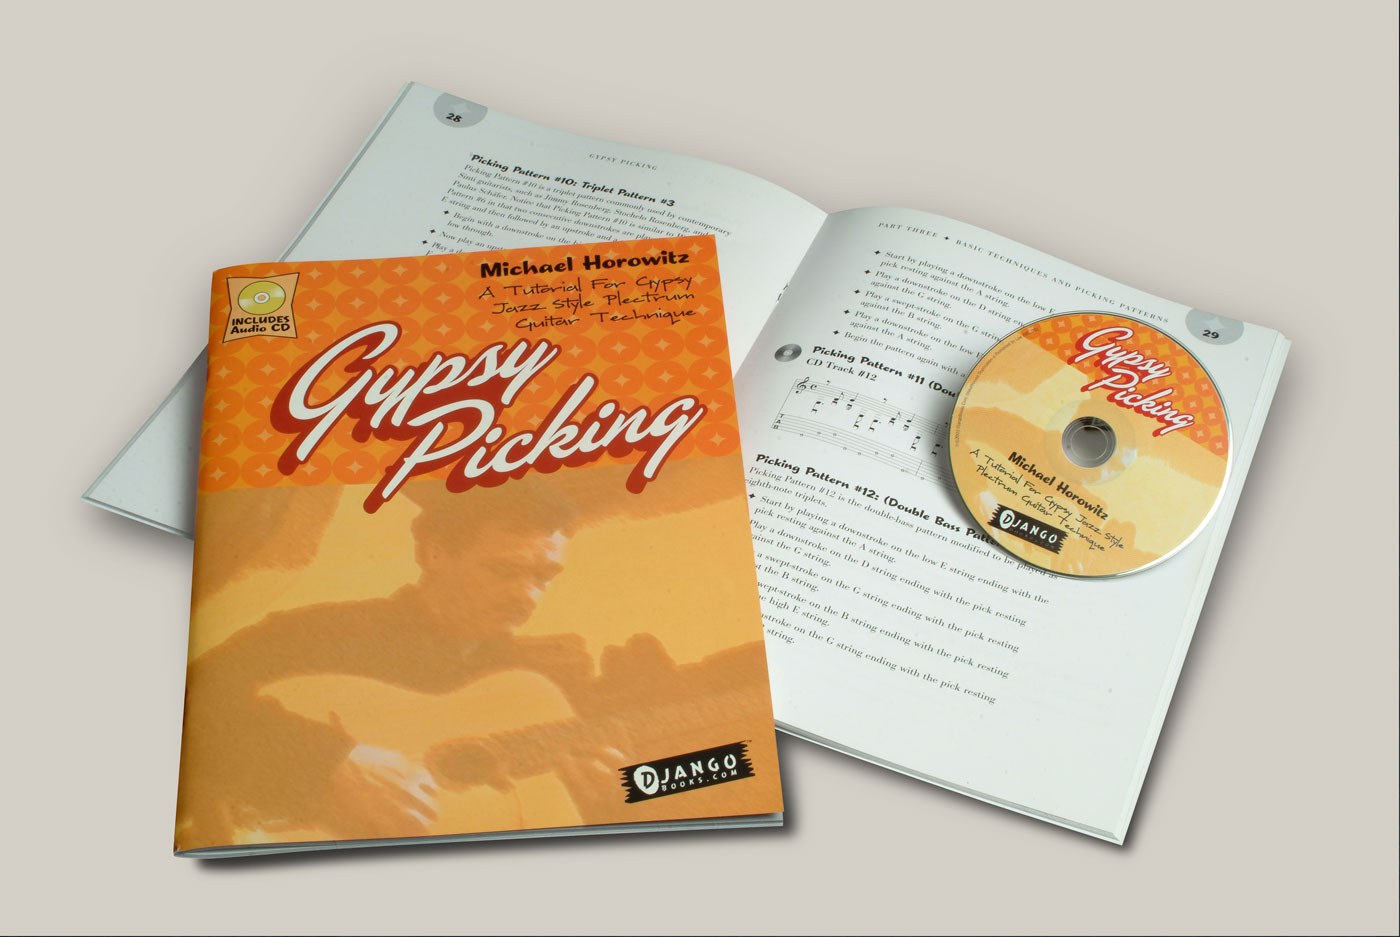 gypsy_picking_book_cd